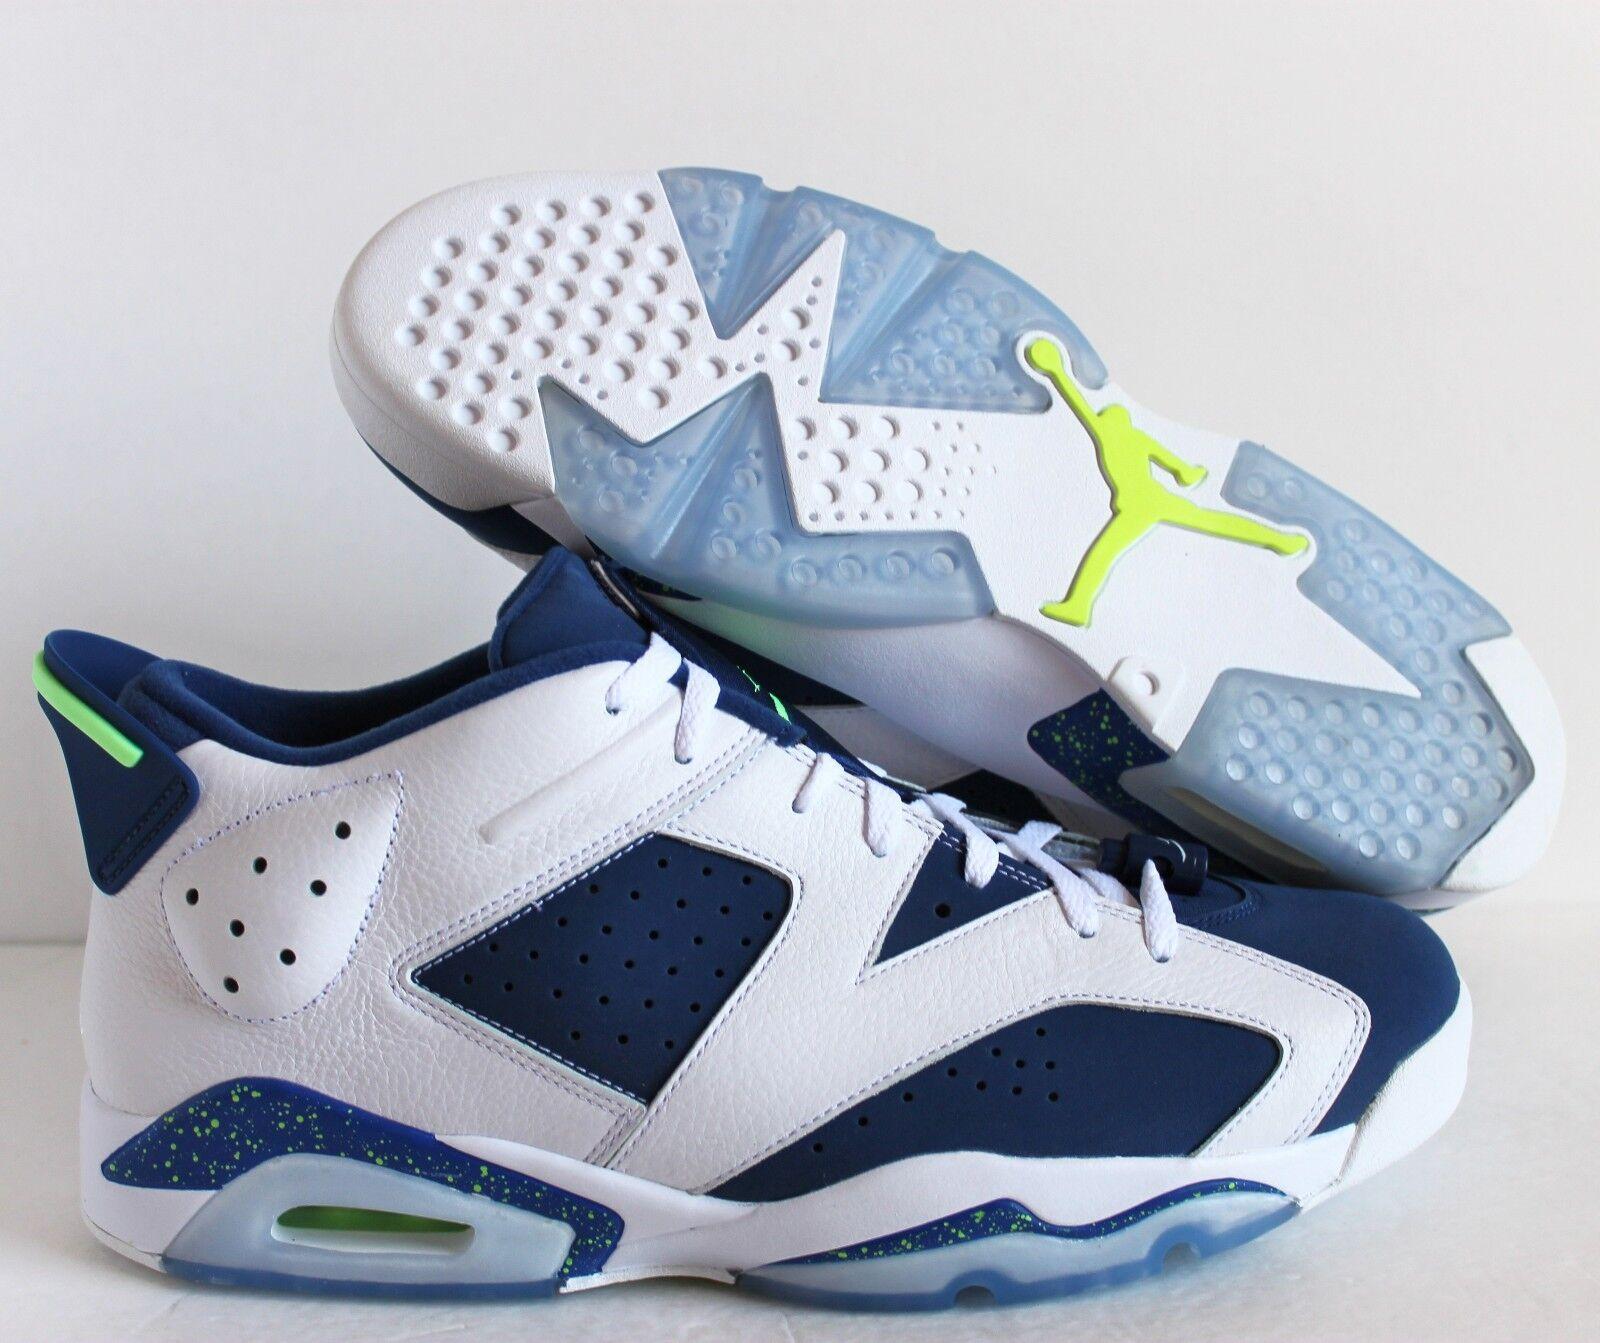 Nike air jordan 6 retrò basso seahawks white-blue-ghost green sz 14 [304401-106]